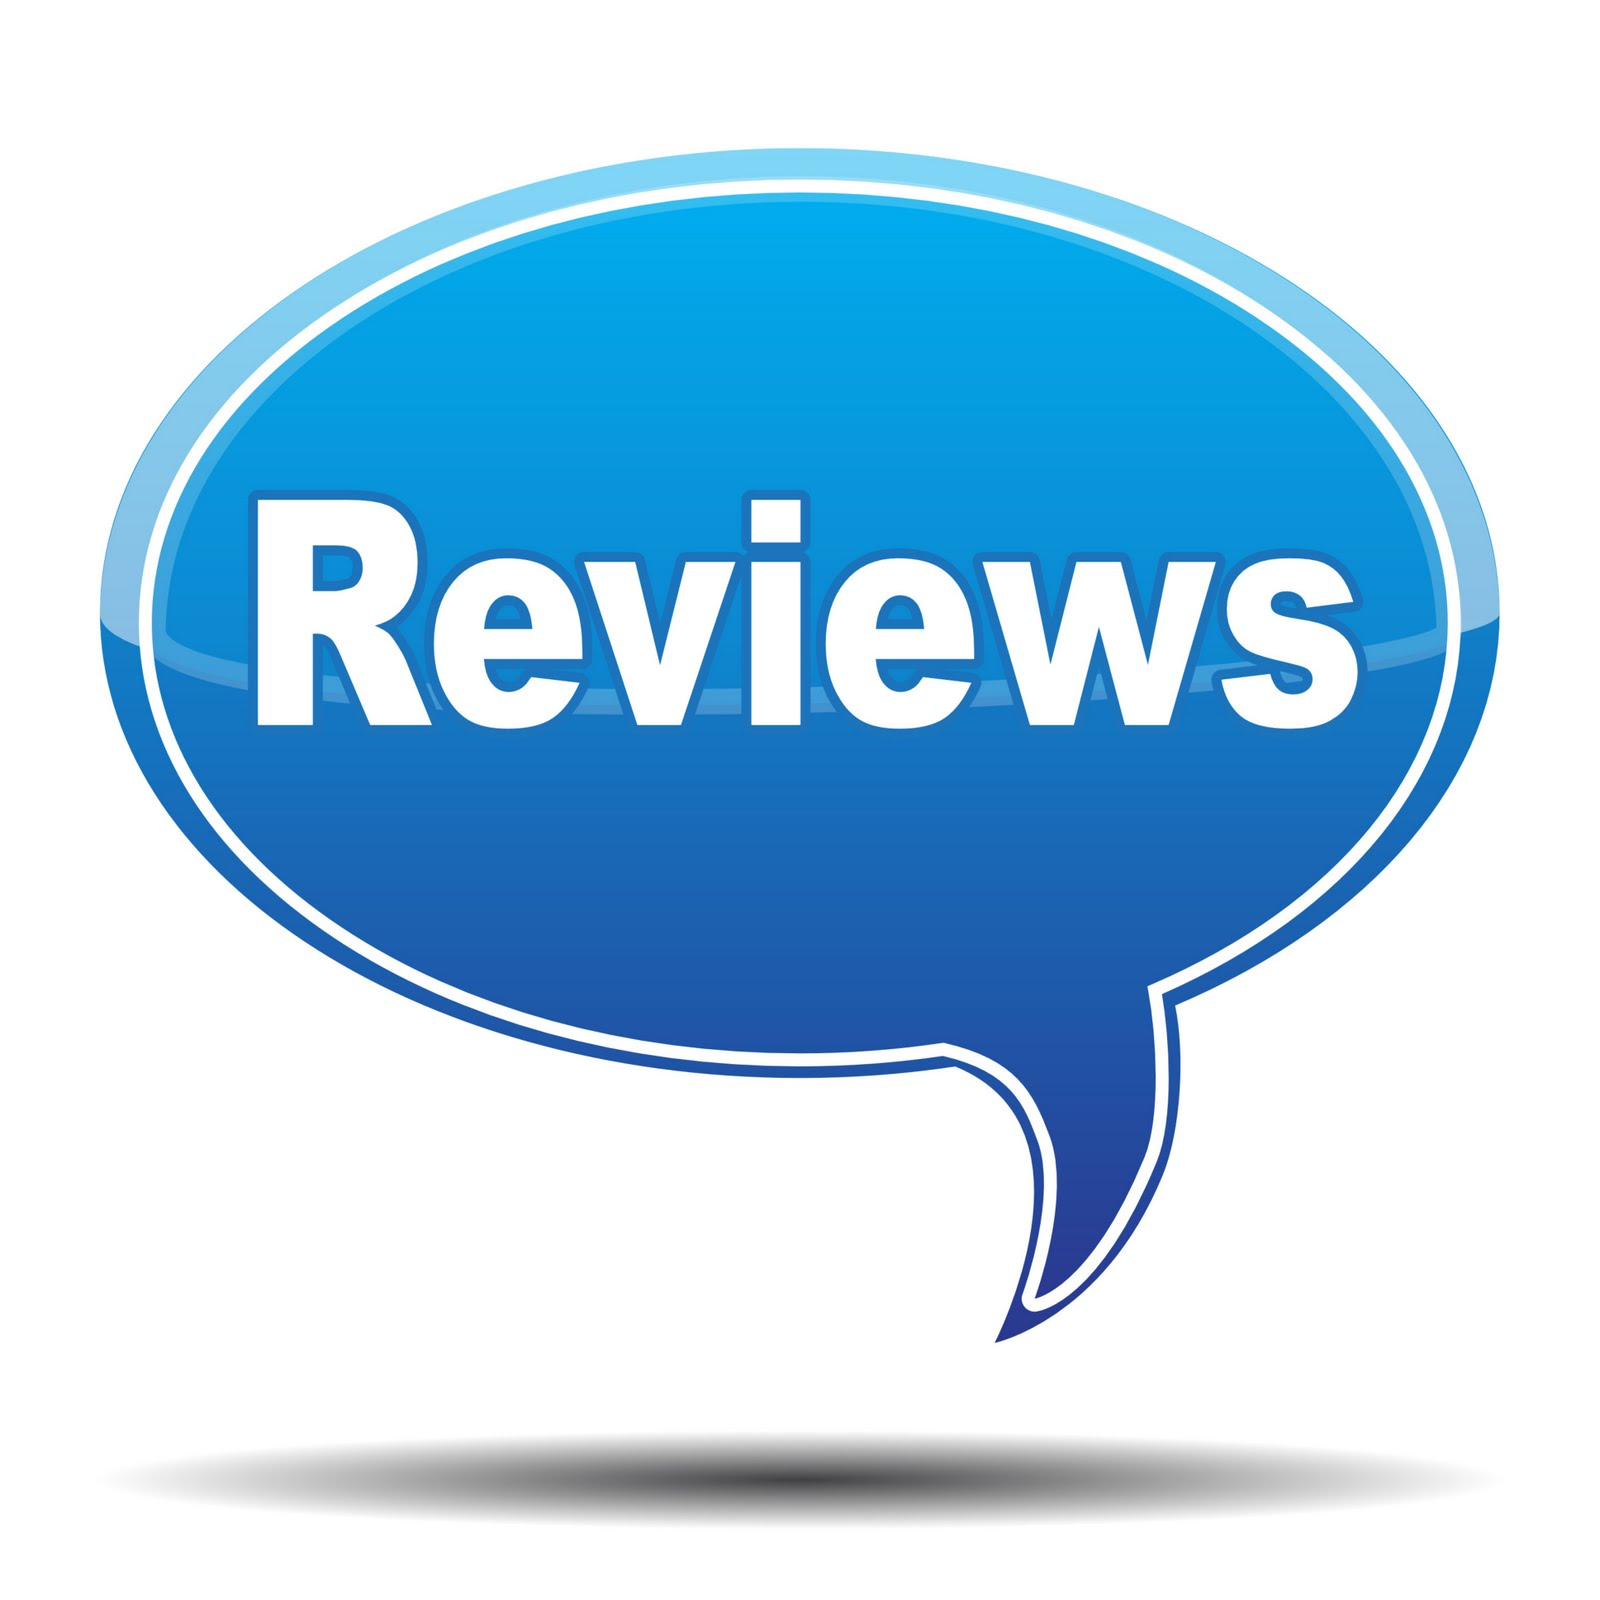 Hudson S Coupon Lady Fotolia Review